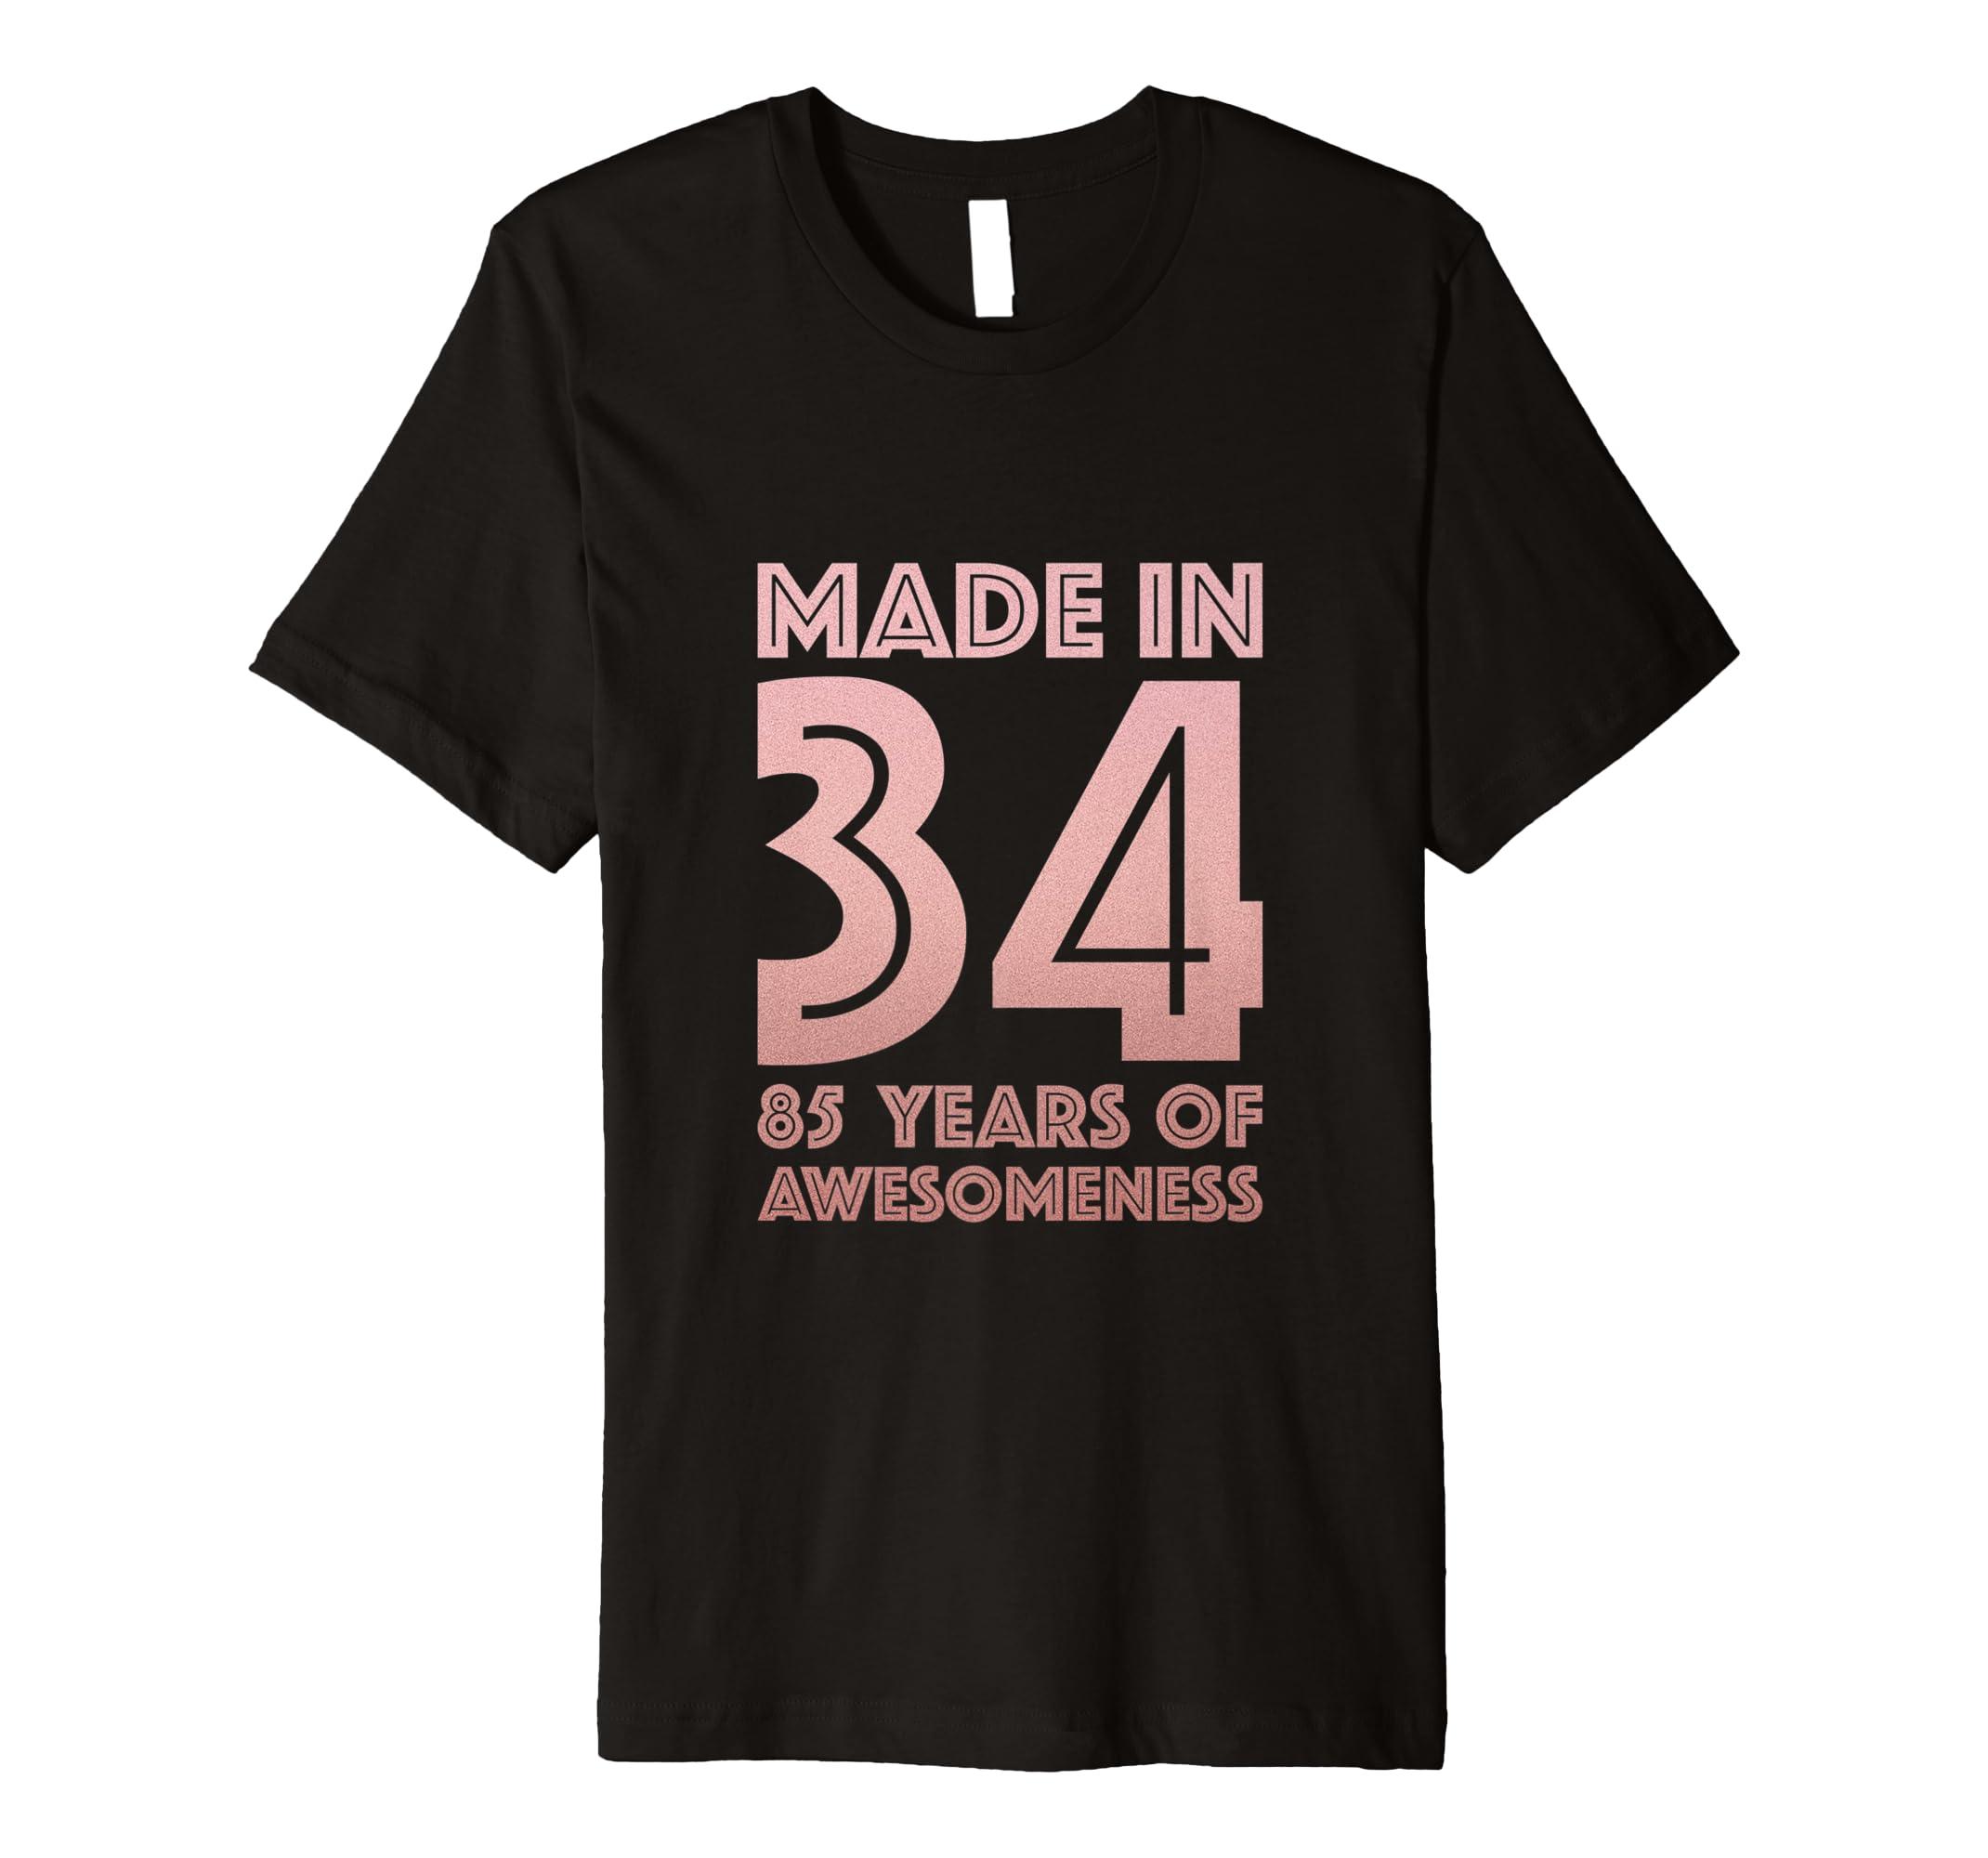 Amazon 85th Birthday Tshirt For Grandma Mom 85 Year Old Women Gifts Clothing